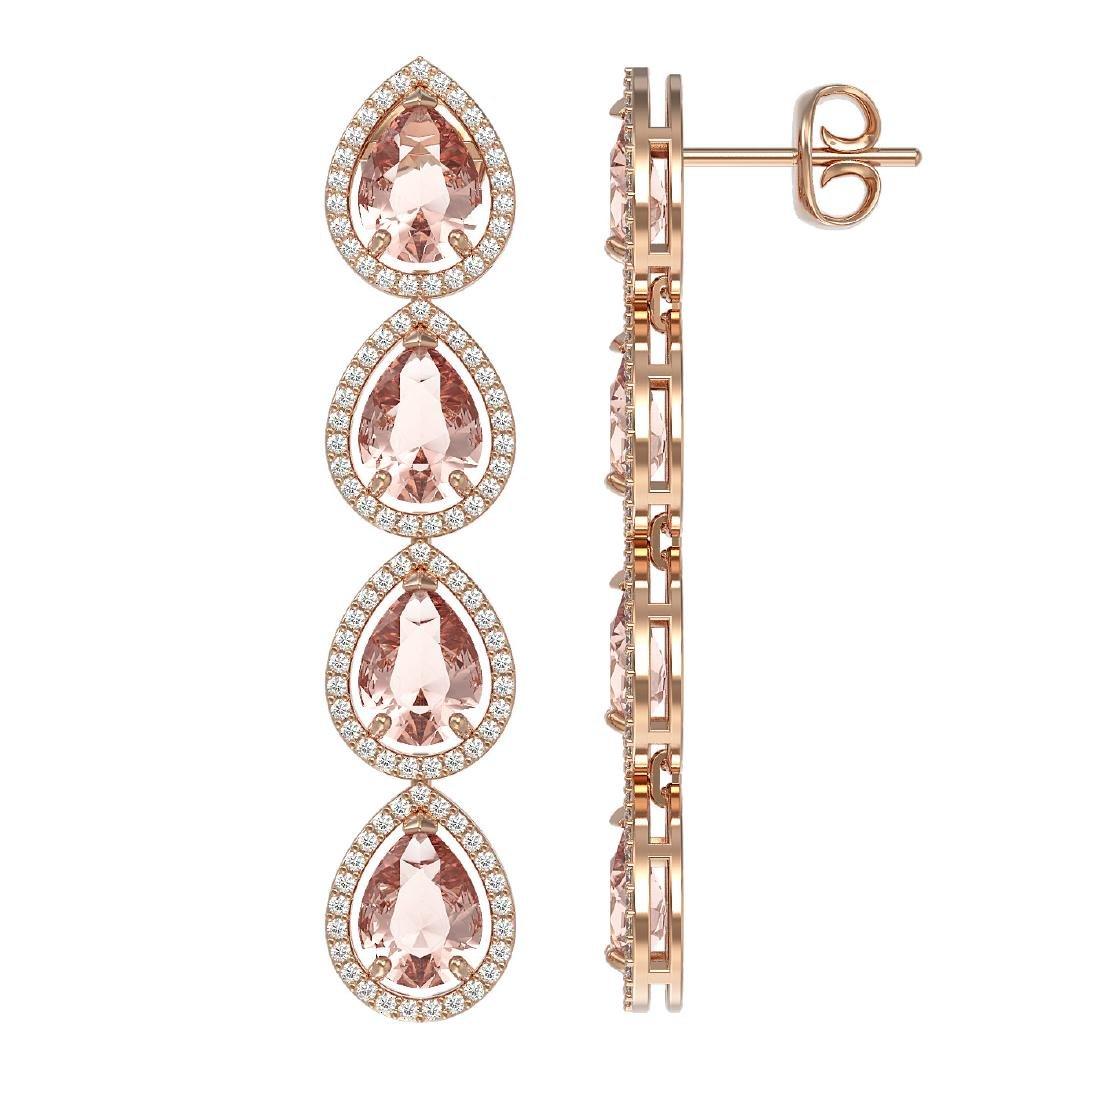 10.4 CTW Morganite & Diamond Halo Earrings 10K Rose - 2